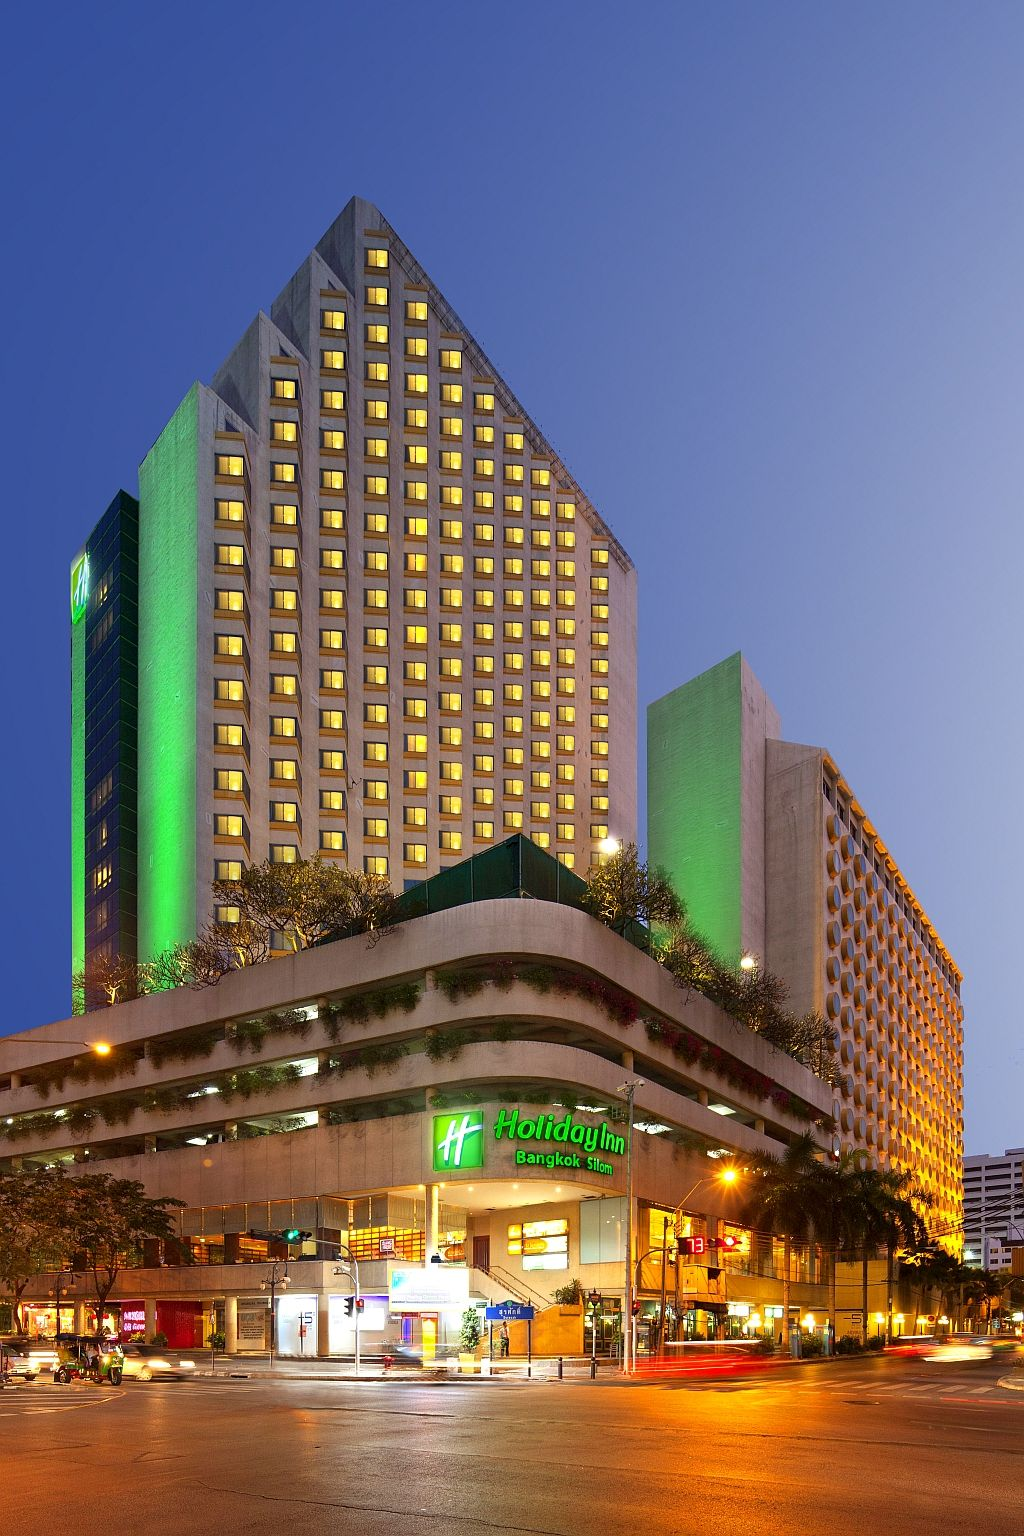 Holiday Inn Bangkok Silom is located on bustling Silom